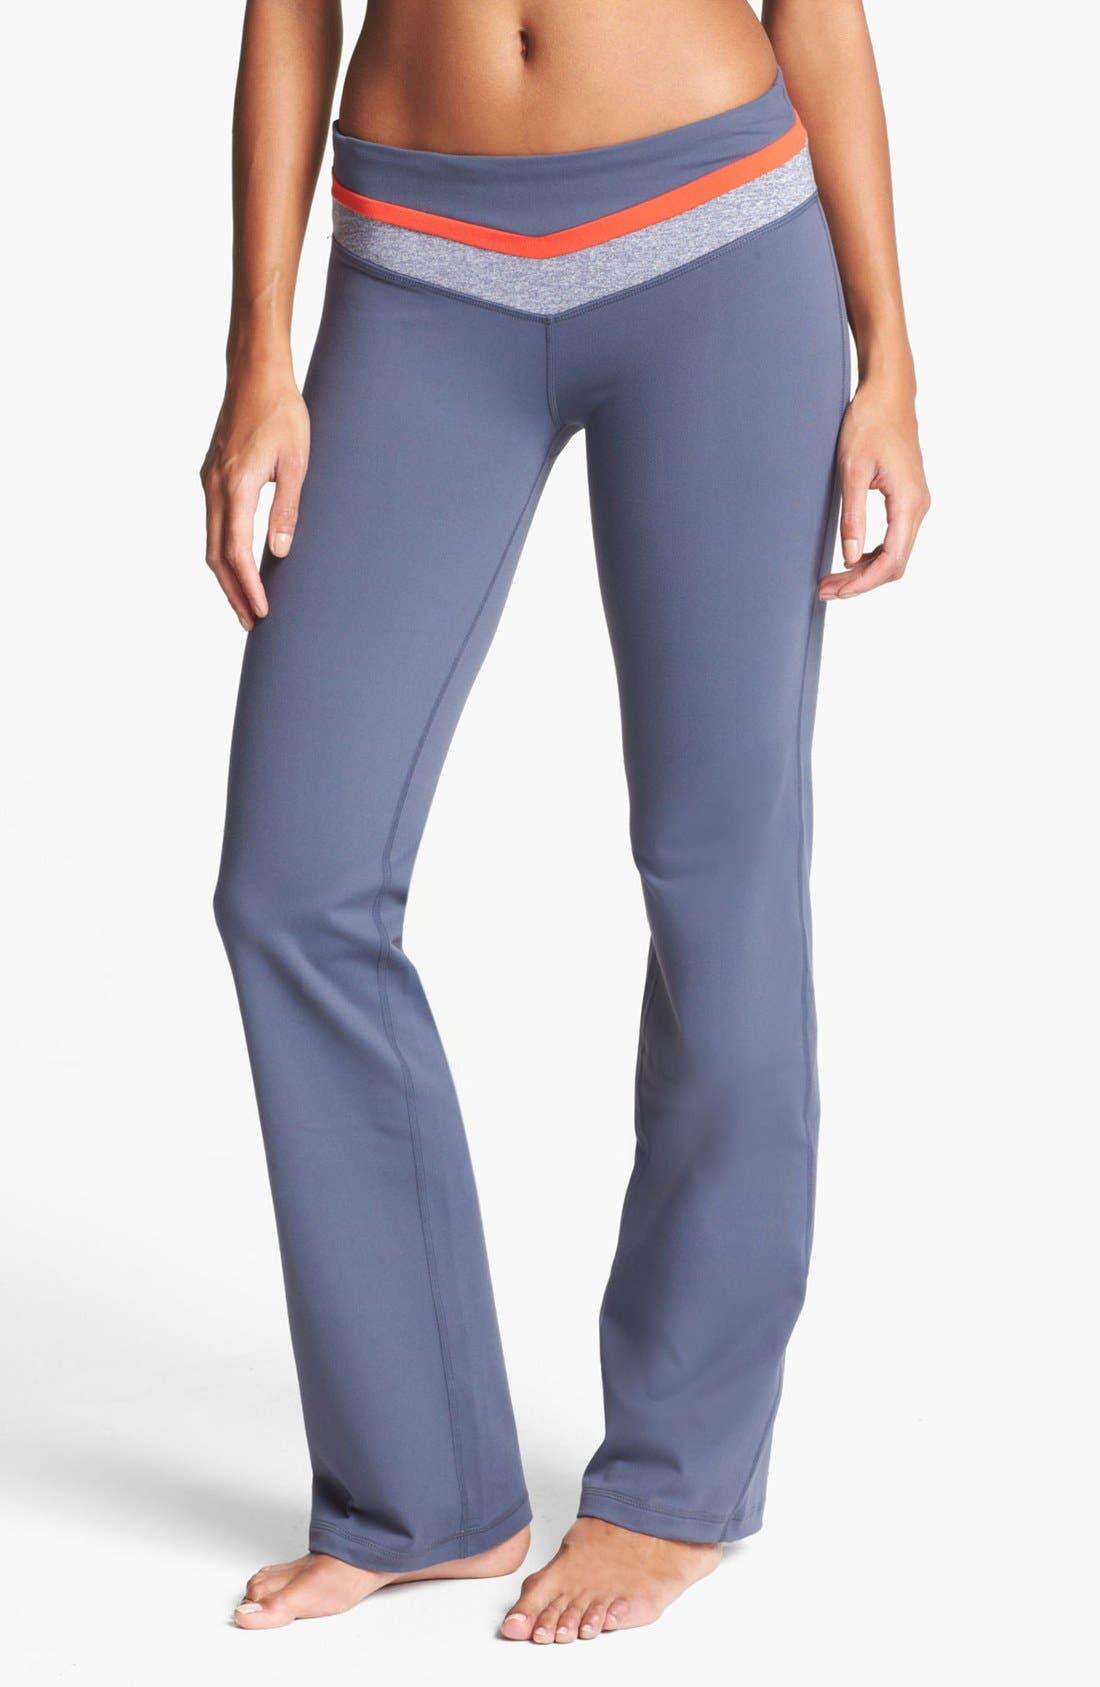 Main Image - Zella 'Booty' Colorblock Waist Pants